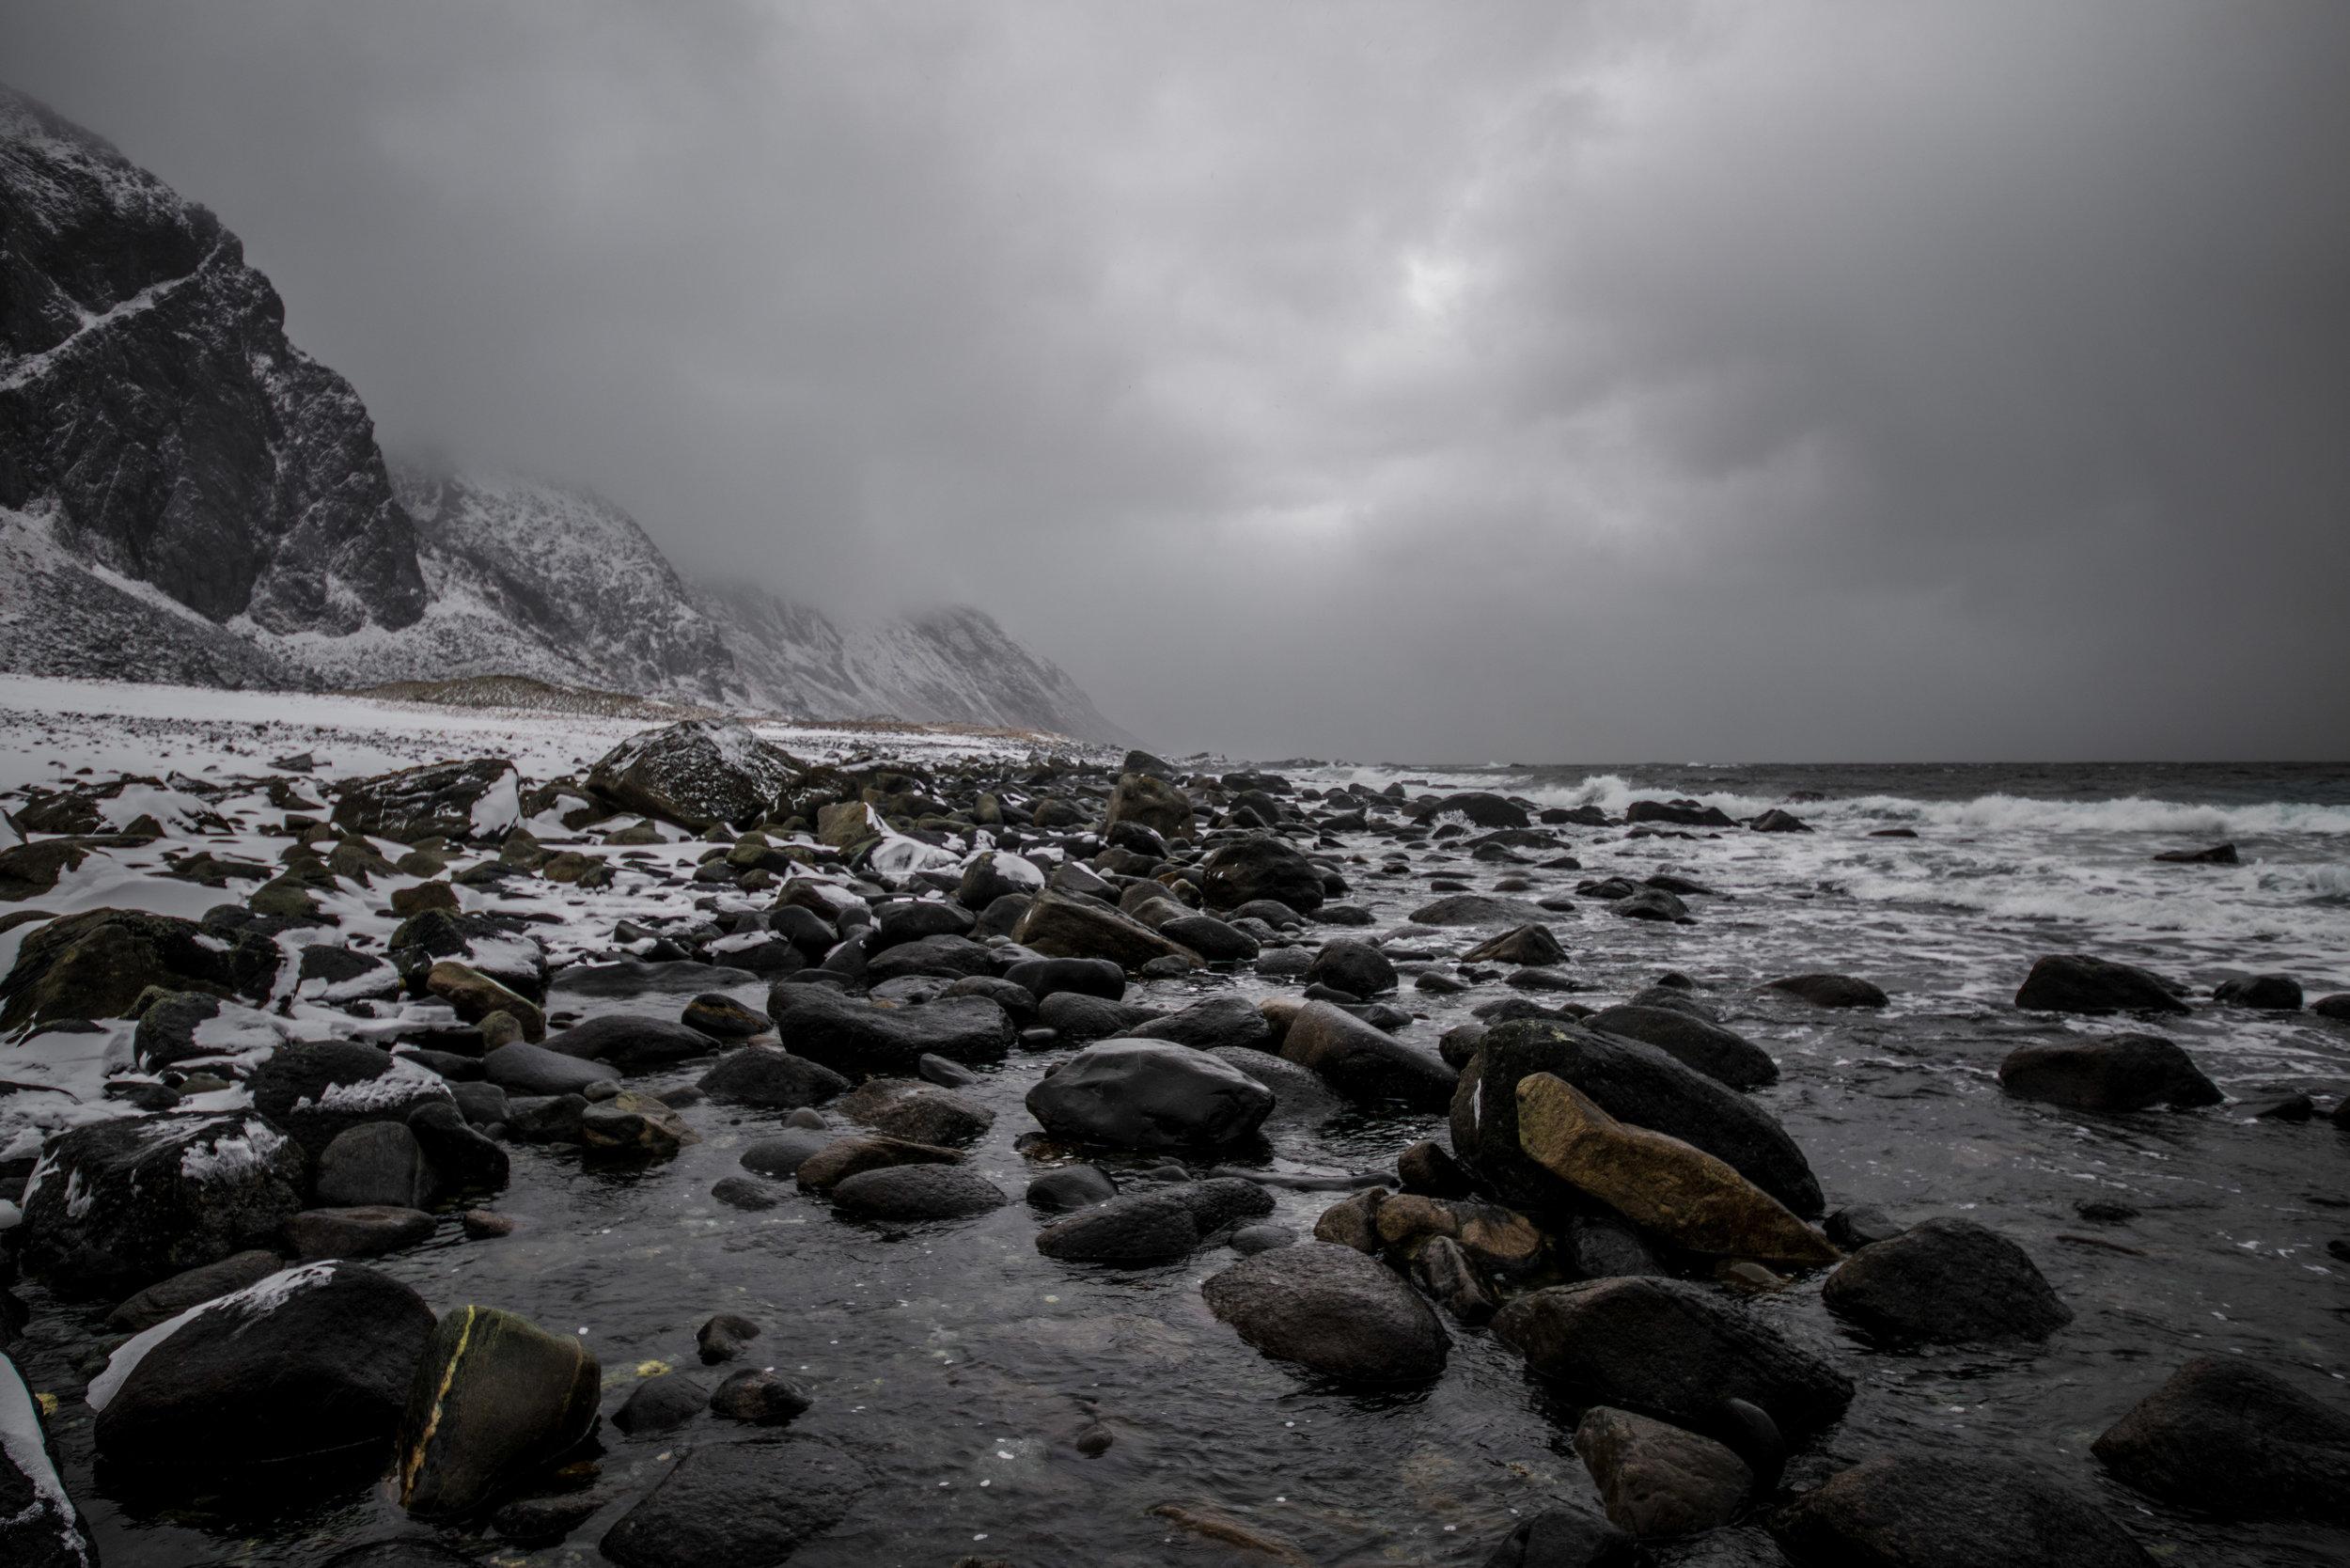 2. The Sea Cliffs of Trælanípa, Isle of Vágar